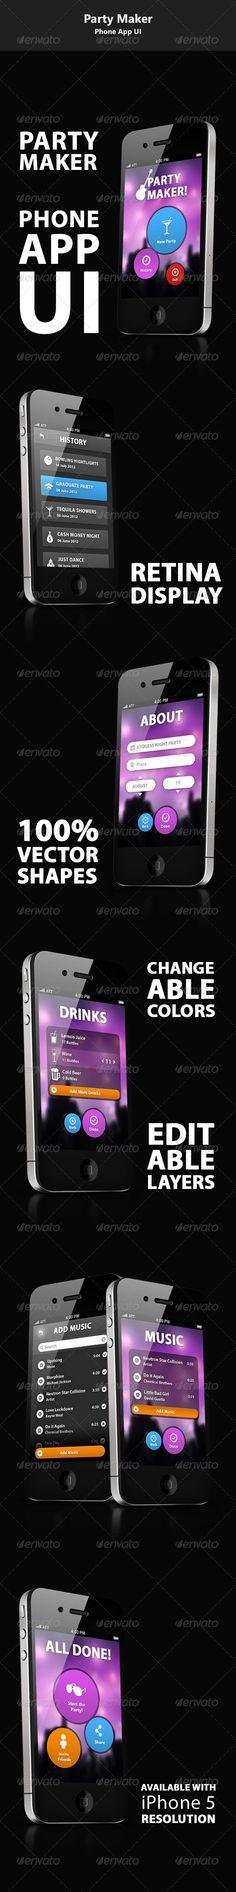 Phone UI App - Party Maker